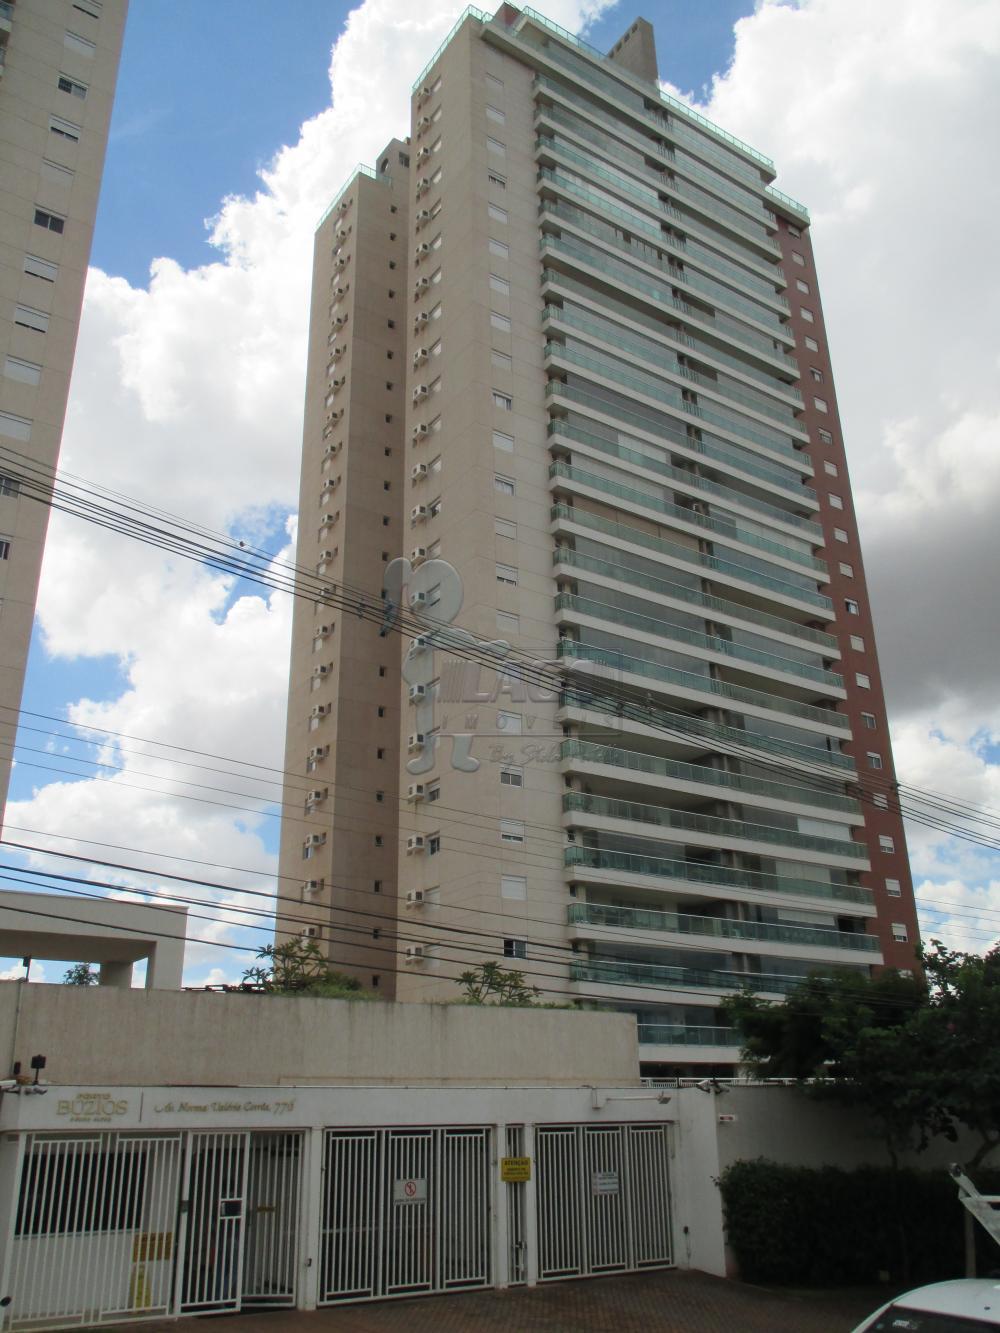 Ribeirao Preto Apartamento Venda R$900.000,00 Condominio R$900,00 3 Dormitorios 3 Suites Area do terreno 38.77m2 Area construida 167.65m2